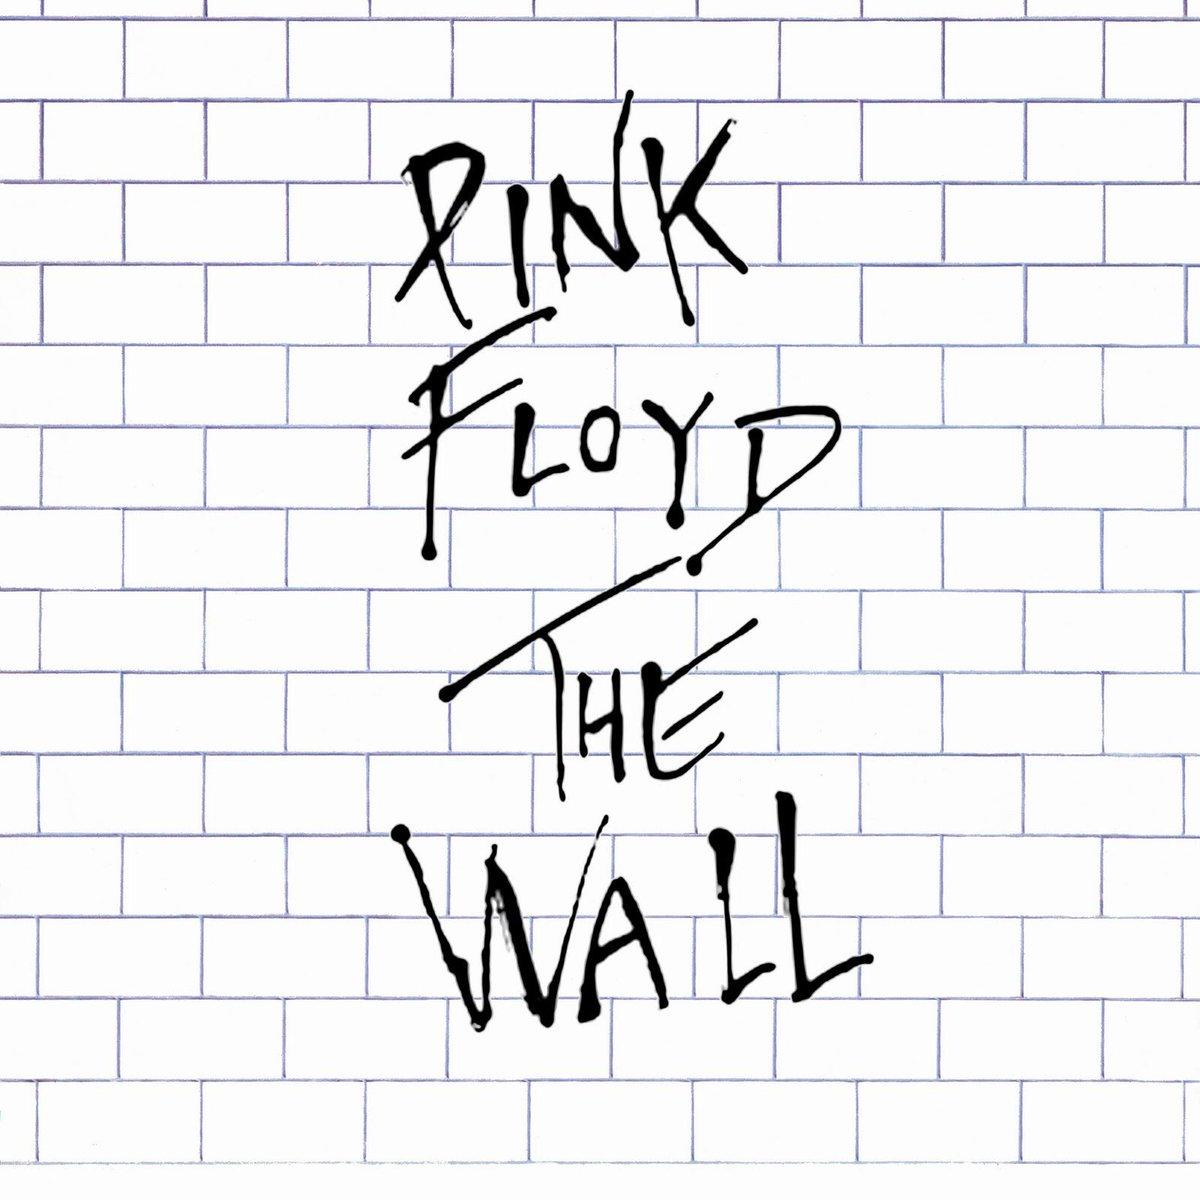 Pink Floyd - легенда британского рока 17